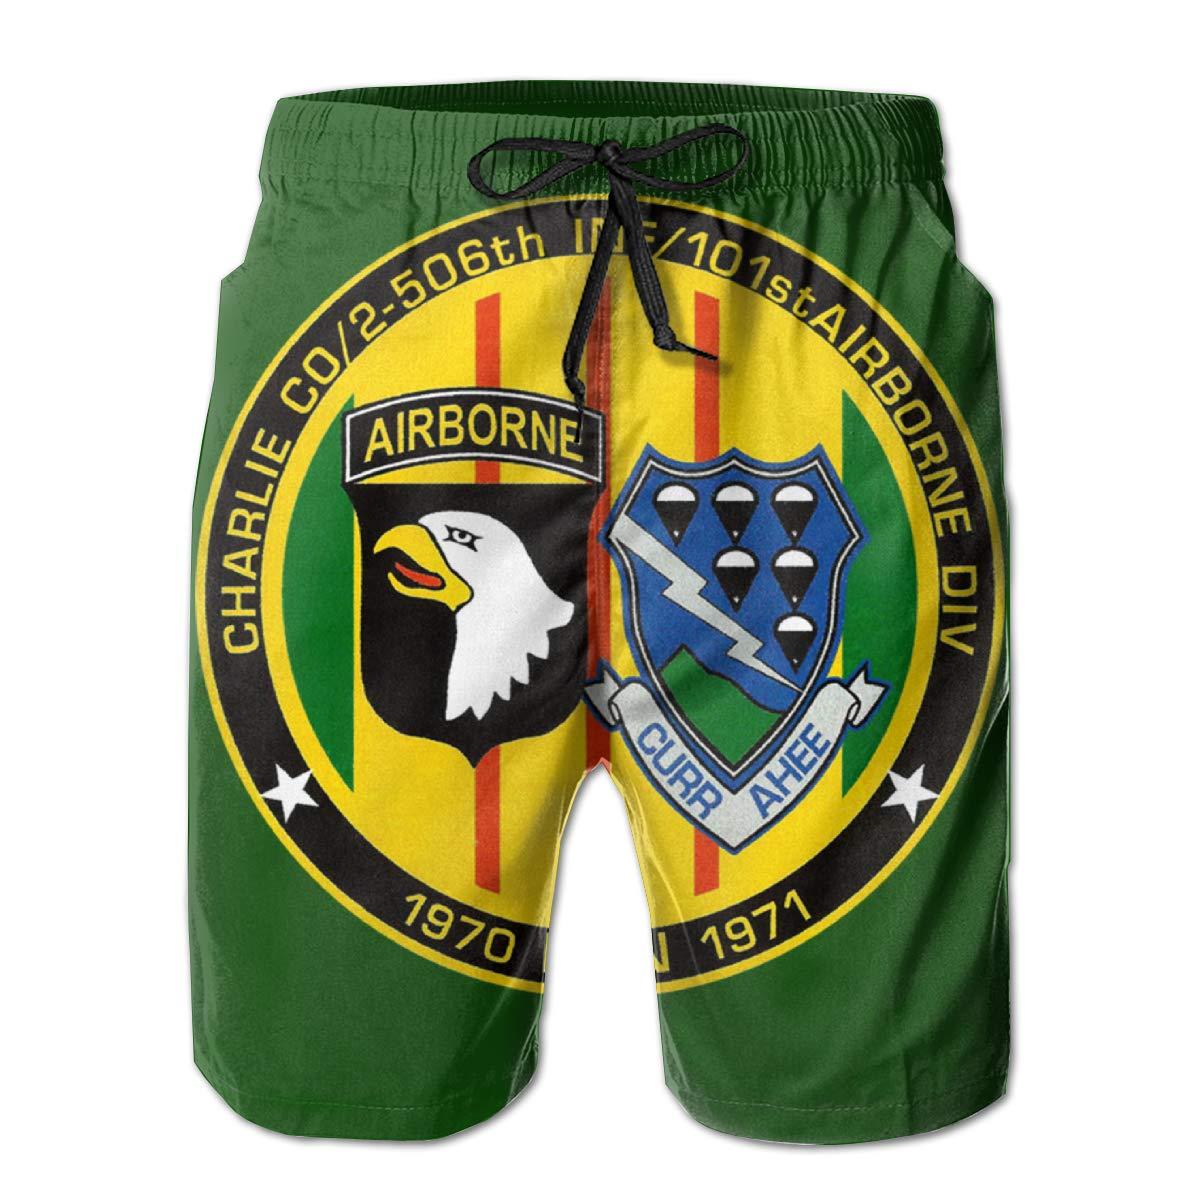 506th Infantry,101st Airborne Mens Board Shorts,Casual Shorts,Beach Shorts Summer Boardshorts